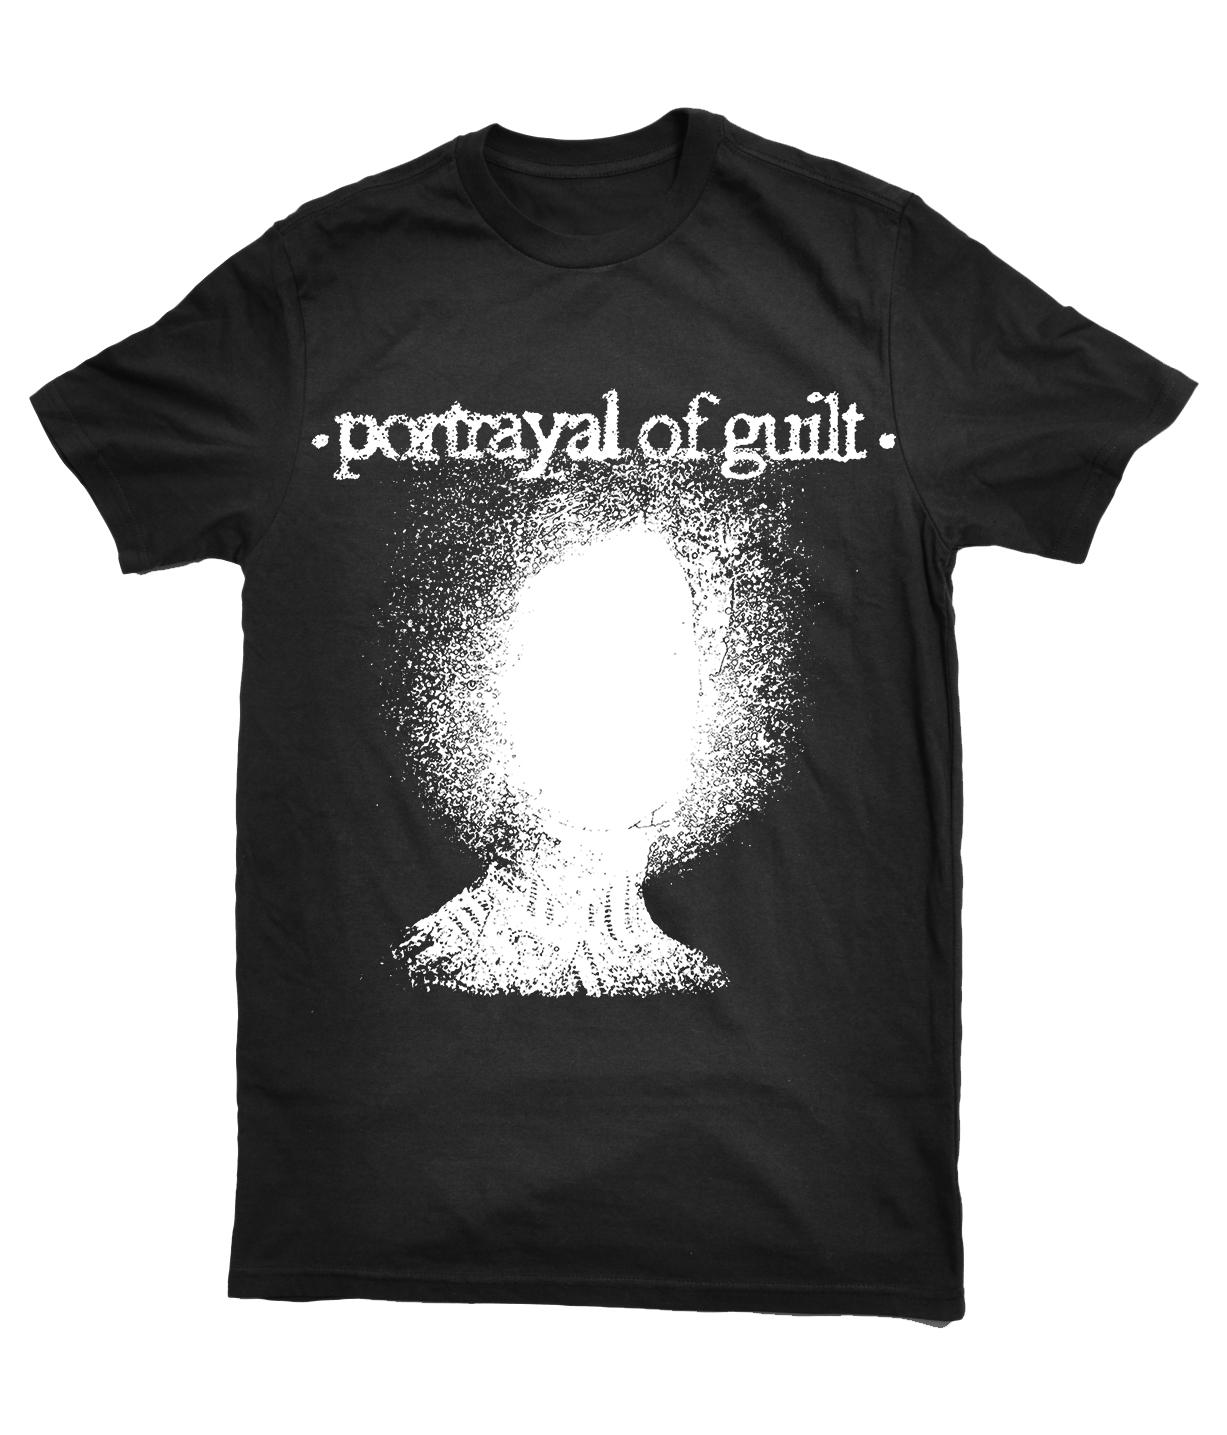 Portrayal of Guilt -  lightheaded shirt